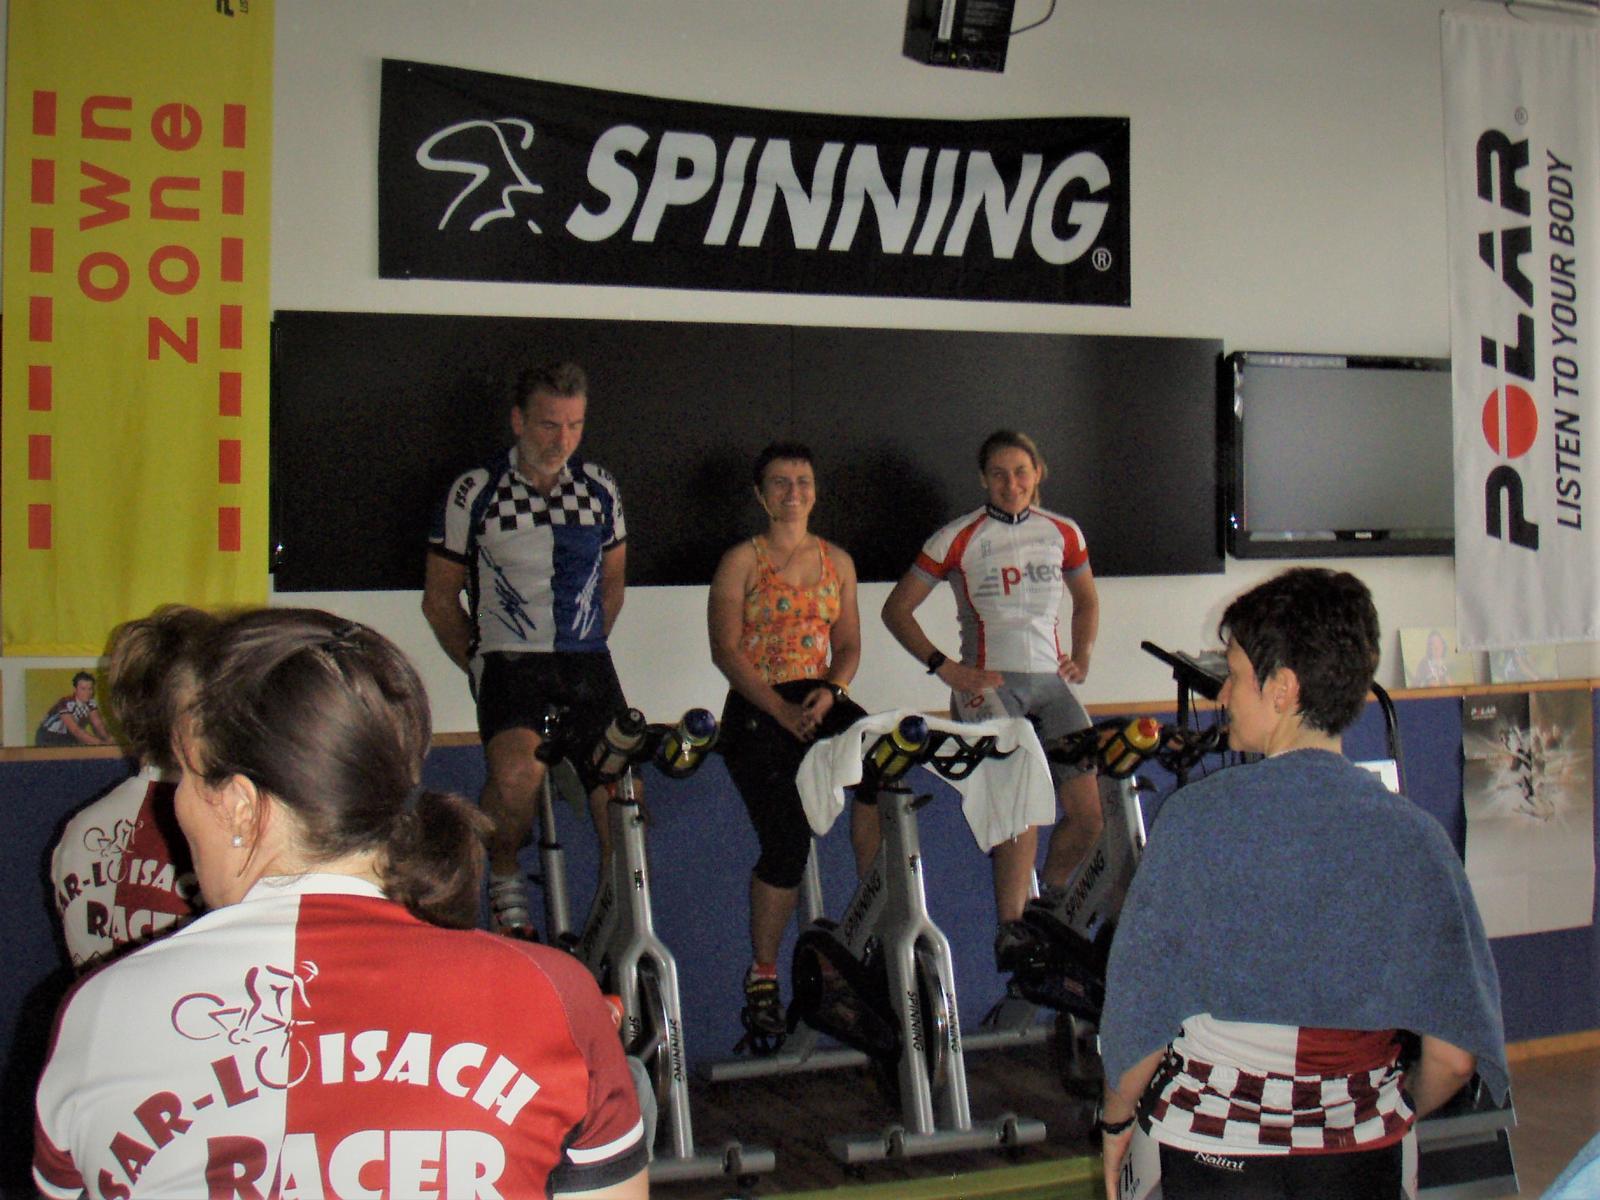 Spinningmarathon-Extrafit-Wolfratshausen-2009